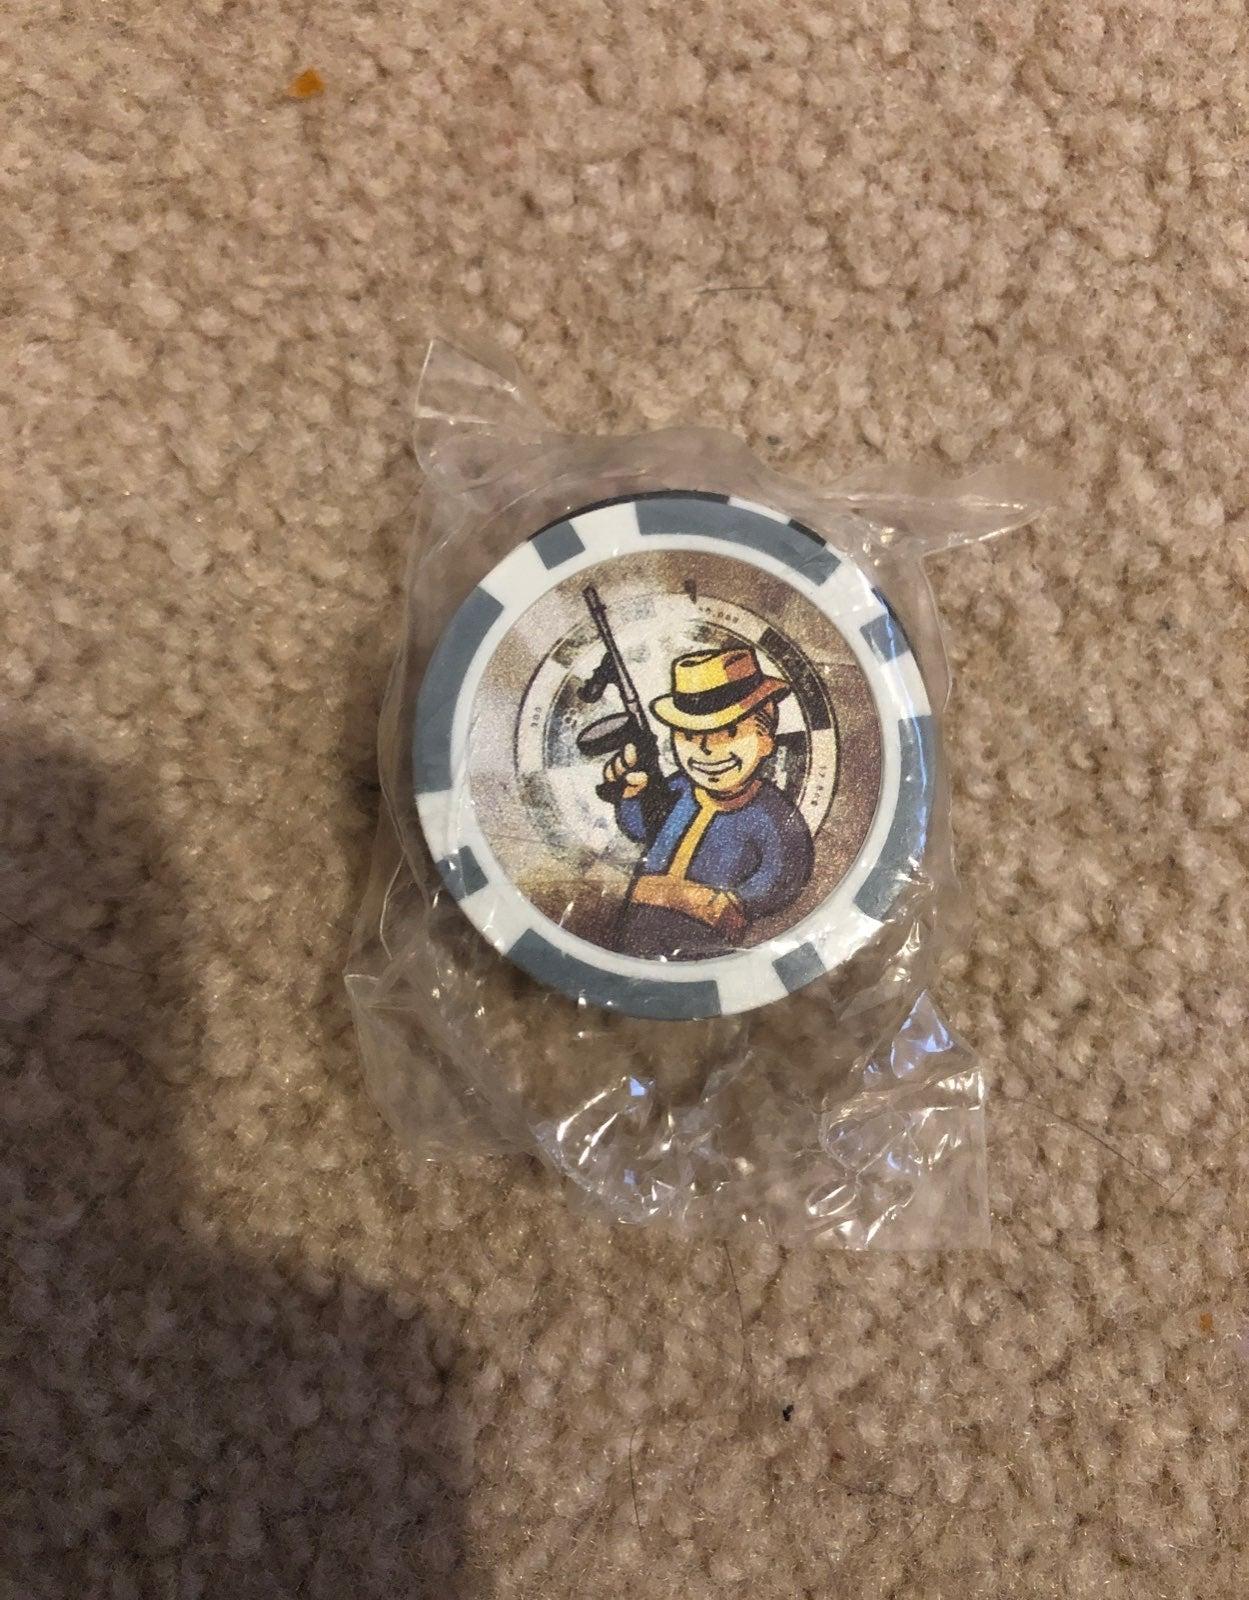 Fallout New Vegas Promotional Poker Chip